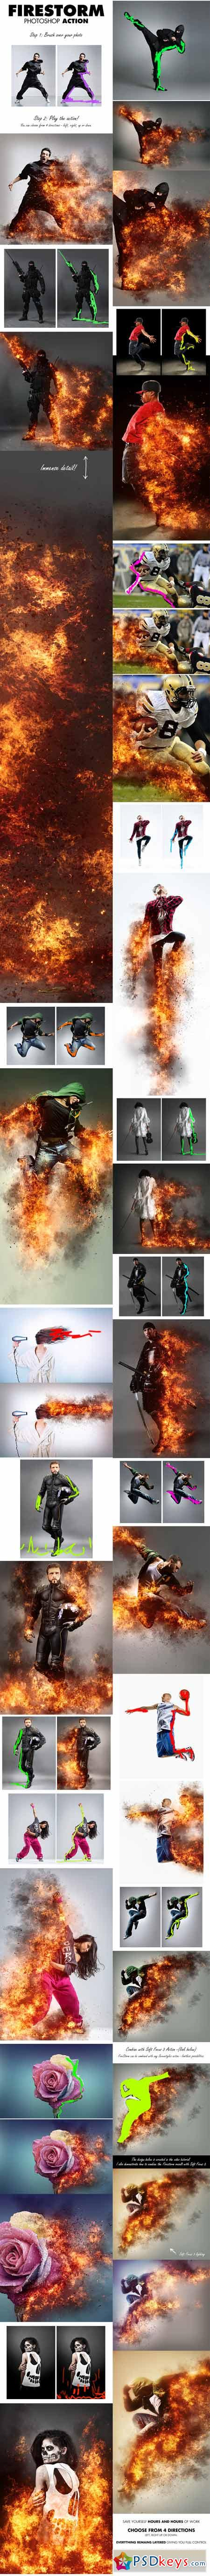 FireStorm Photoshop Action 13392199